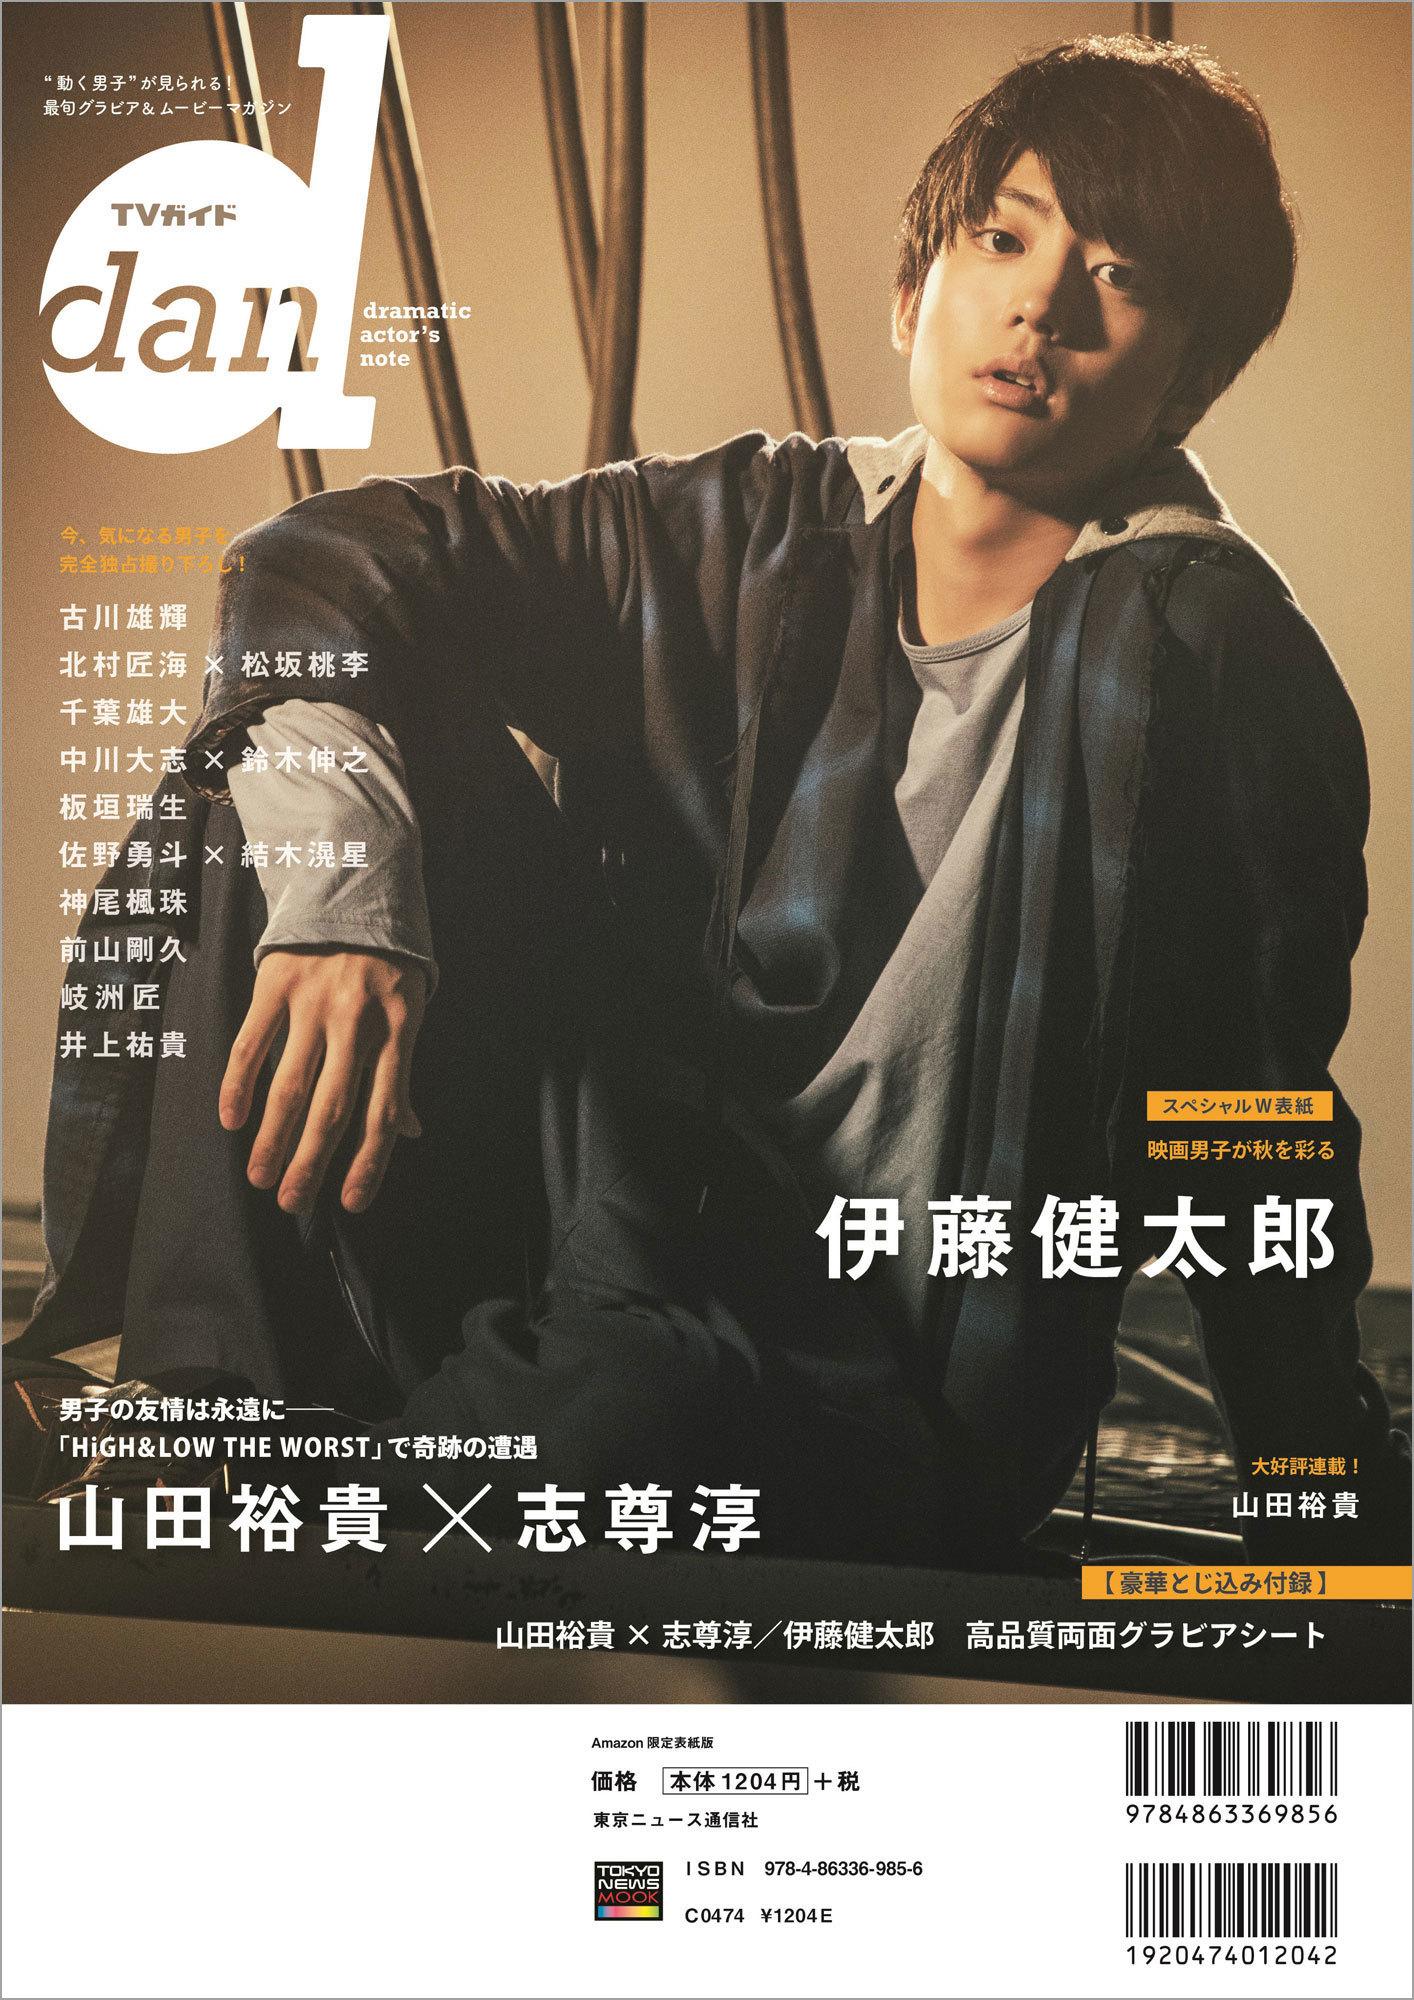 「TVガイドdan vol.26Amazon限定表紙版」(東京ニュース通信社刊)